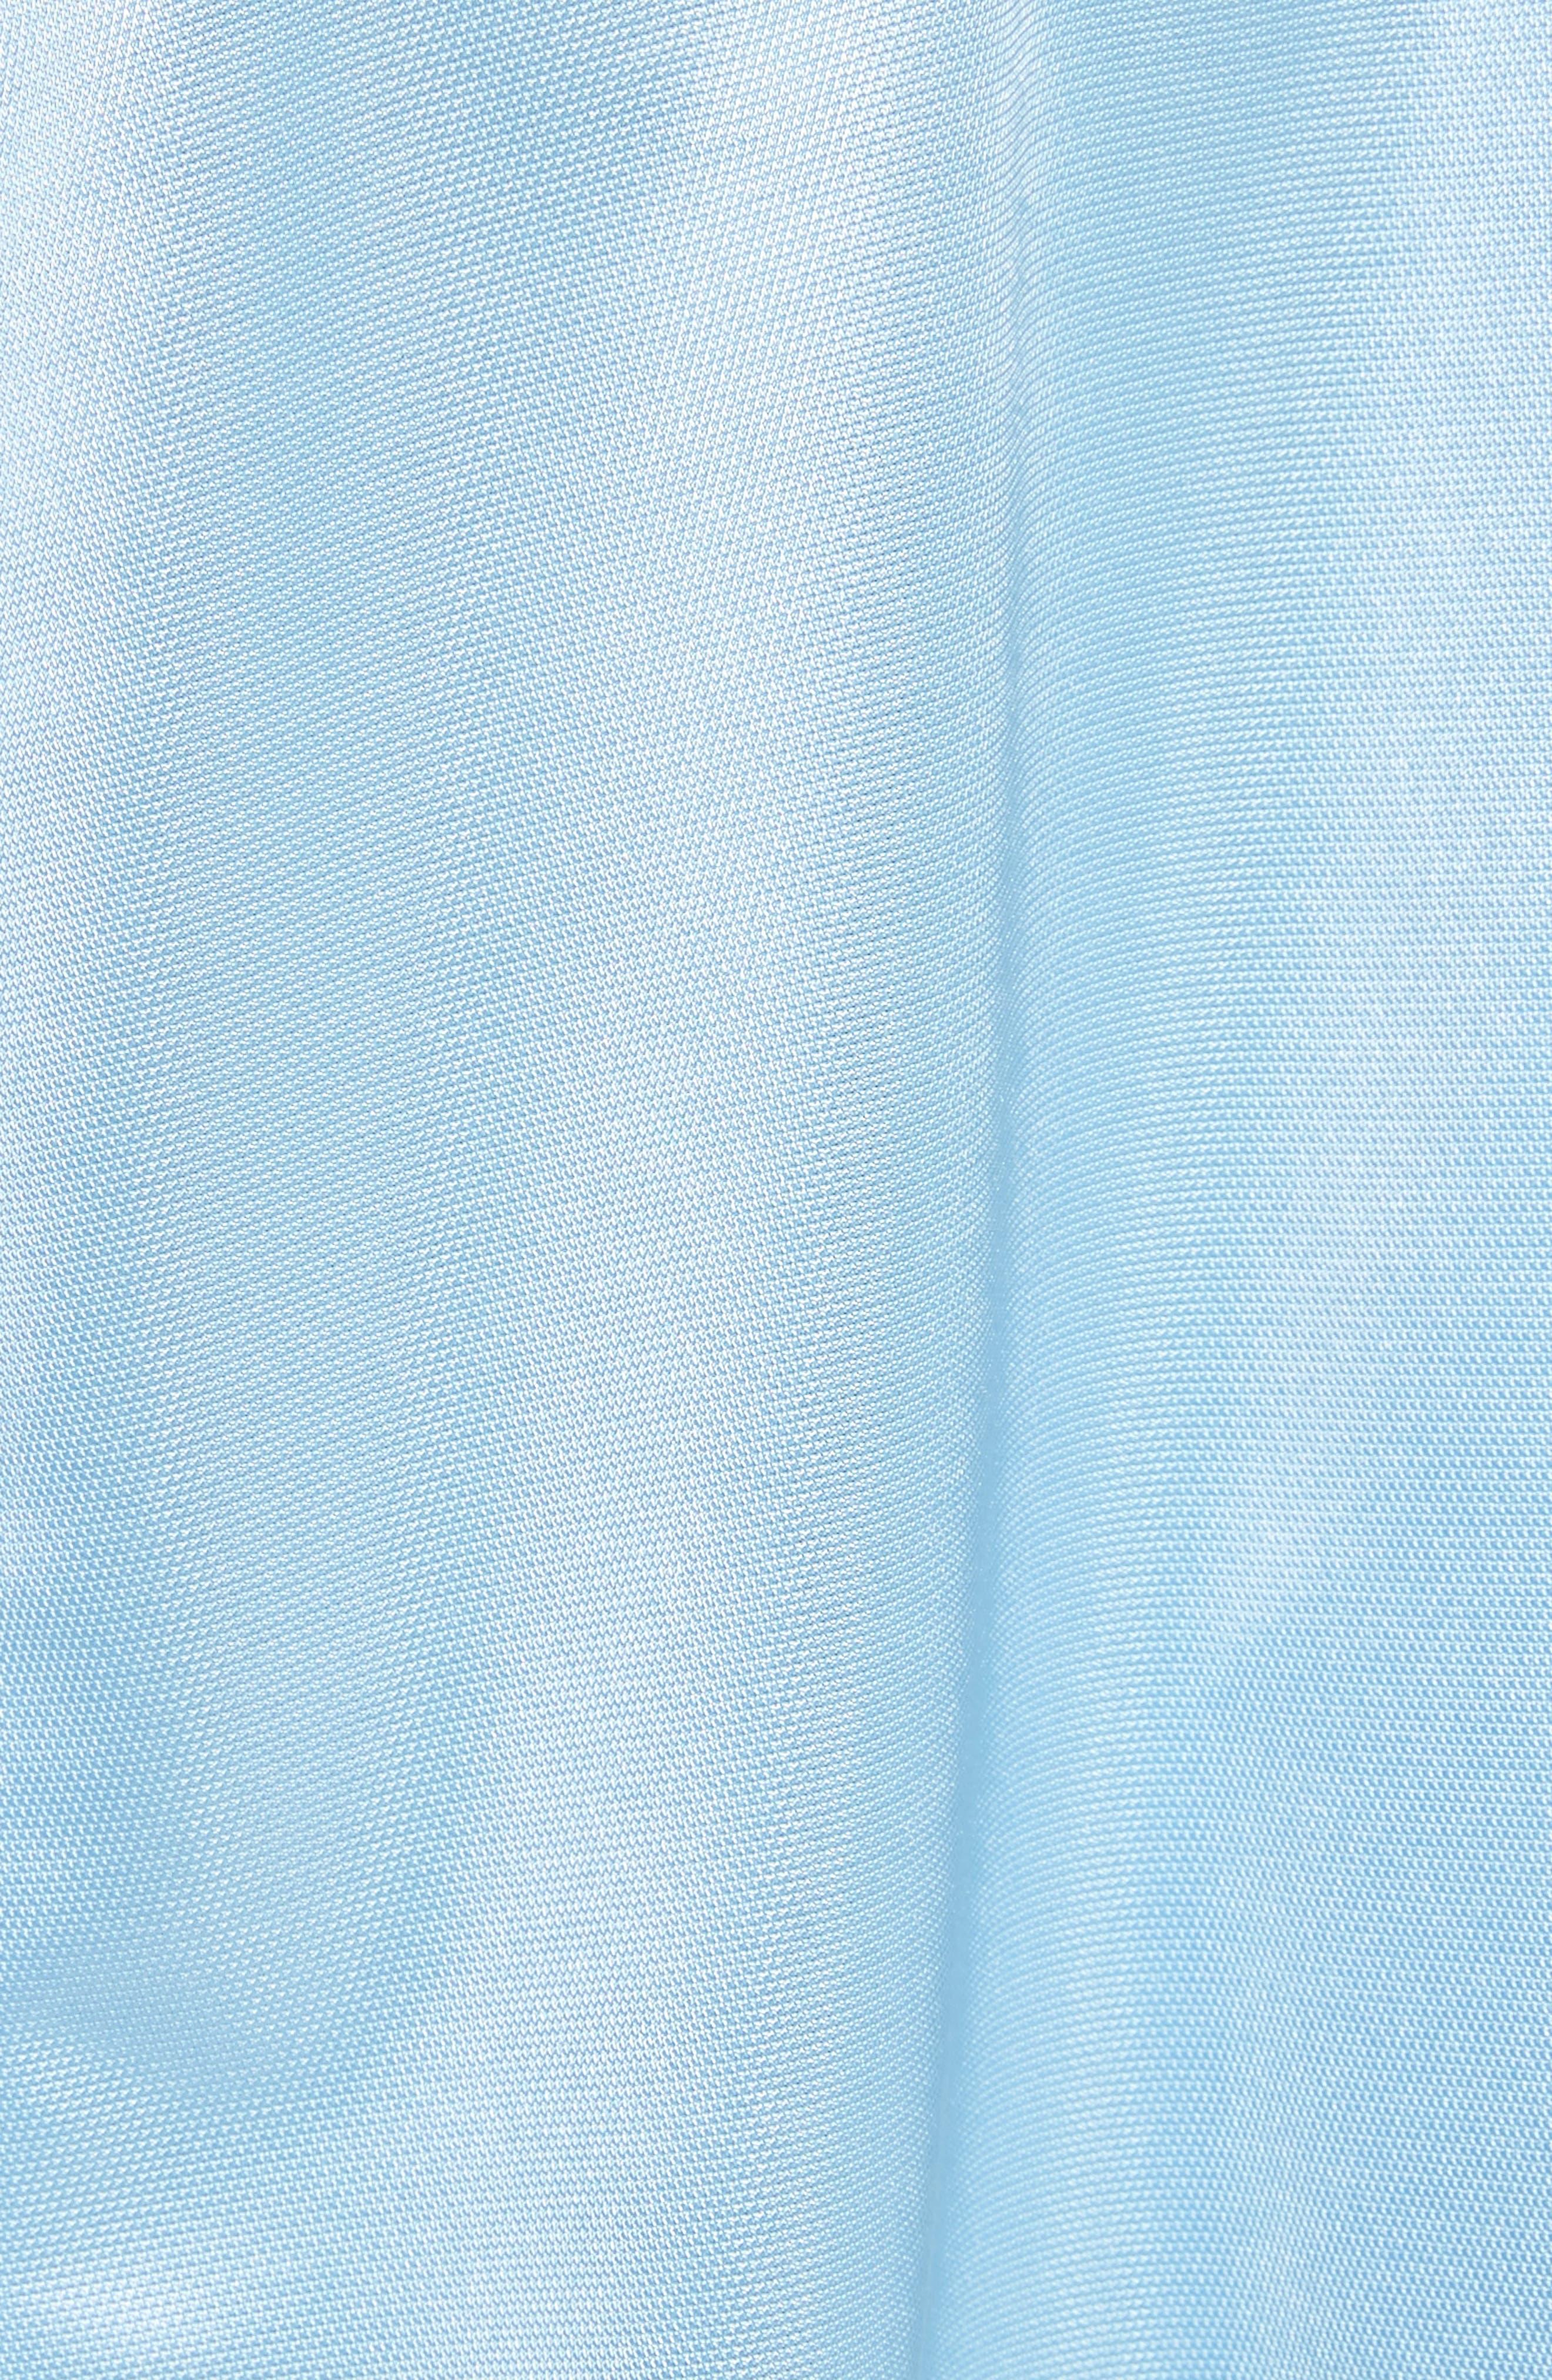 Dolman Sleeve Top,                             Alternate thumbnail 5, color,                             Oxford Blue